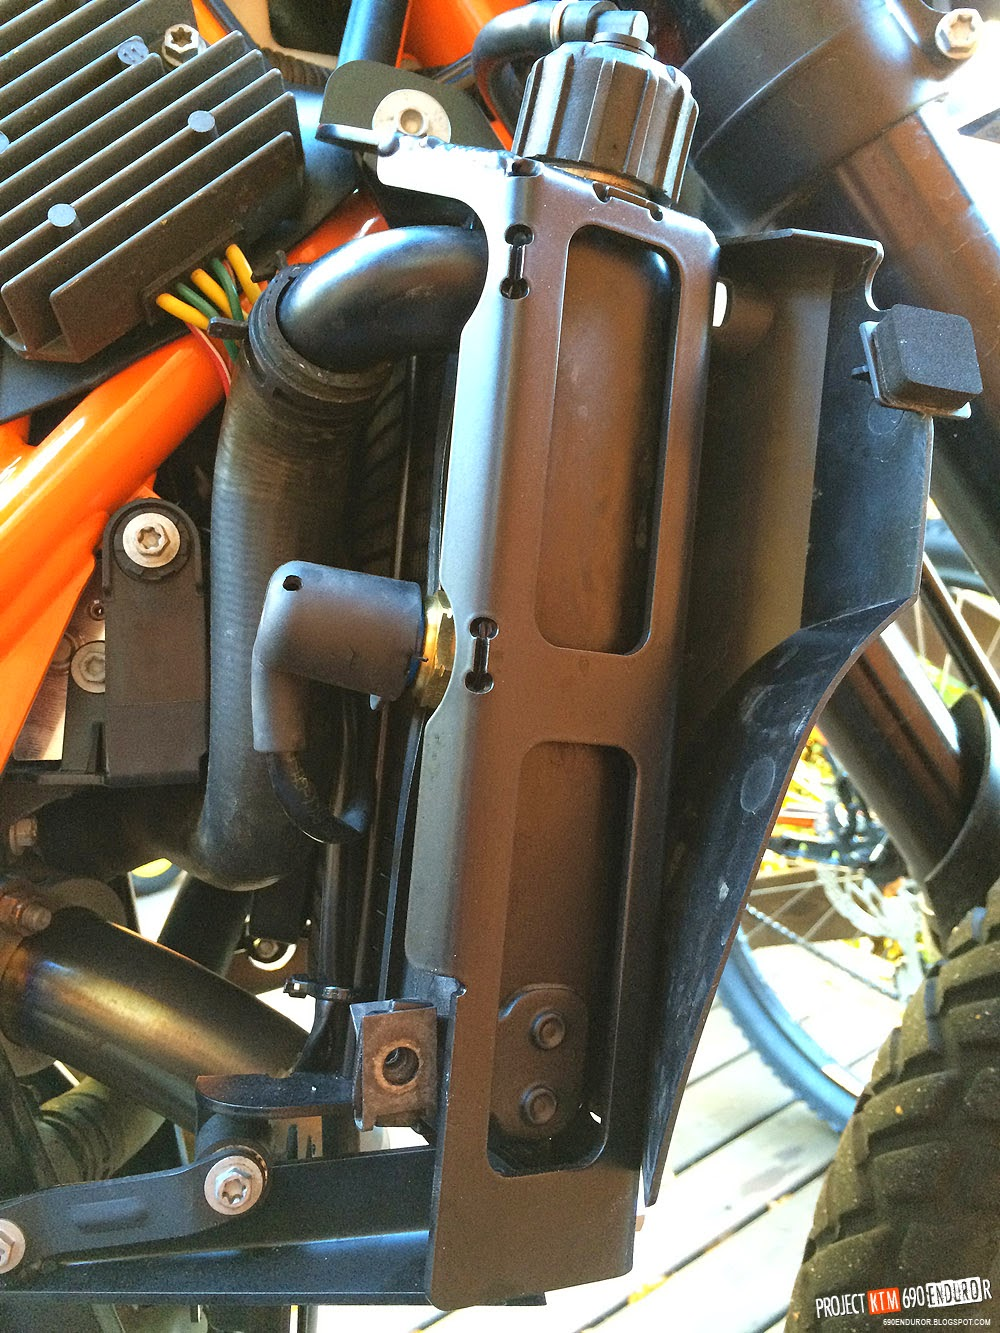 KTM 690 Enduro R radiator protector